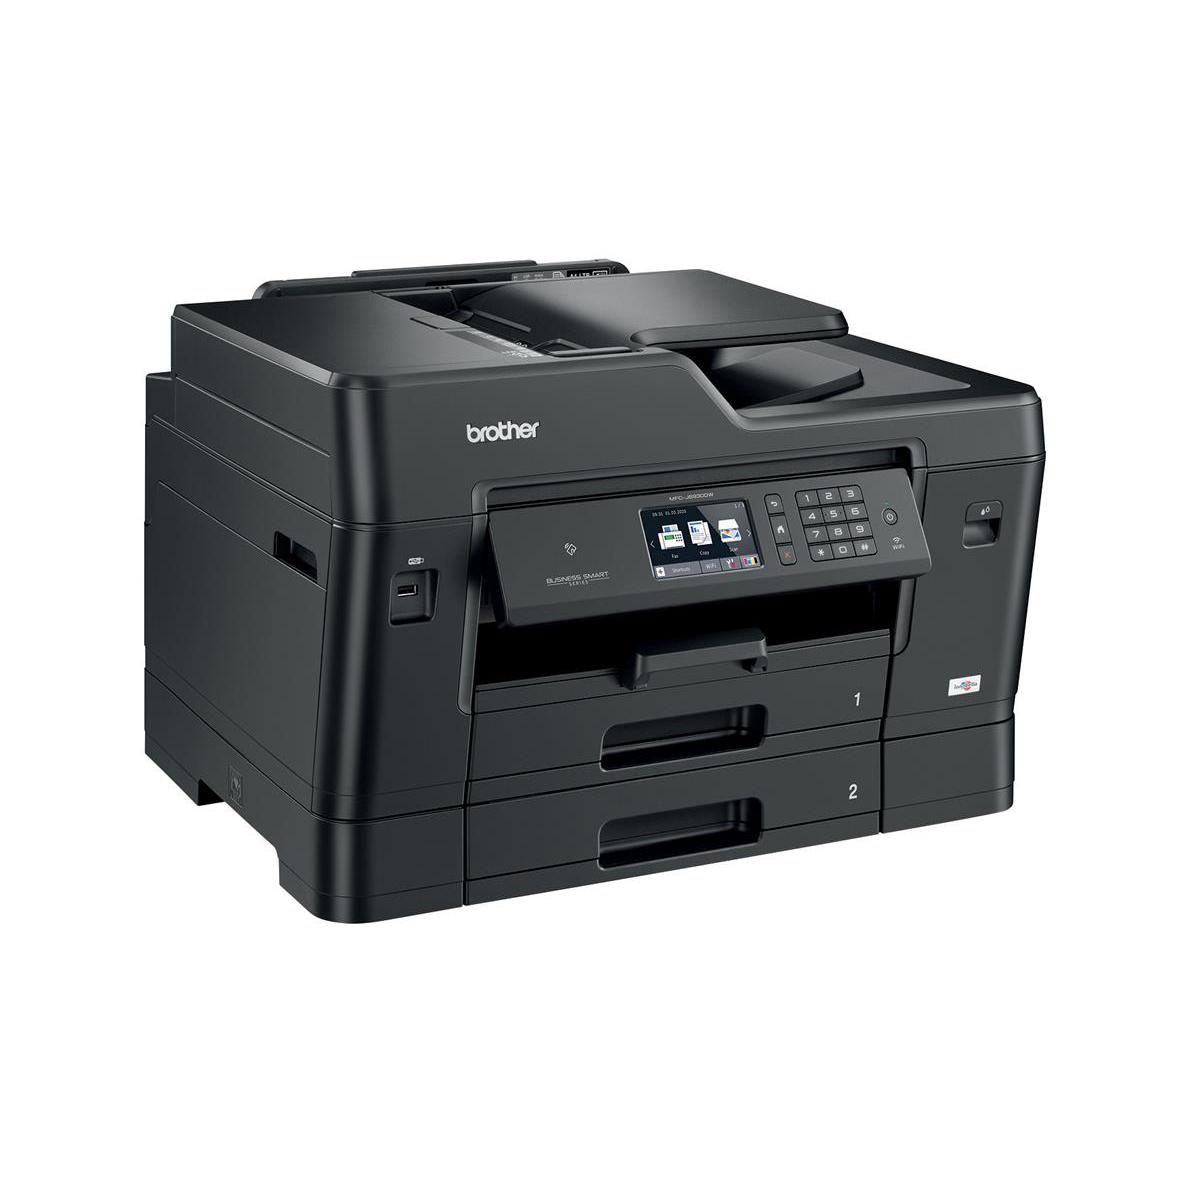 Brother Colour Multifunction A3 Inkjet Printer Ref MFCJ6930DWZU1